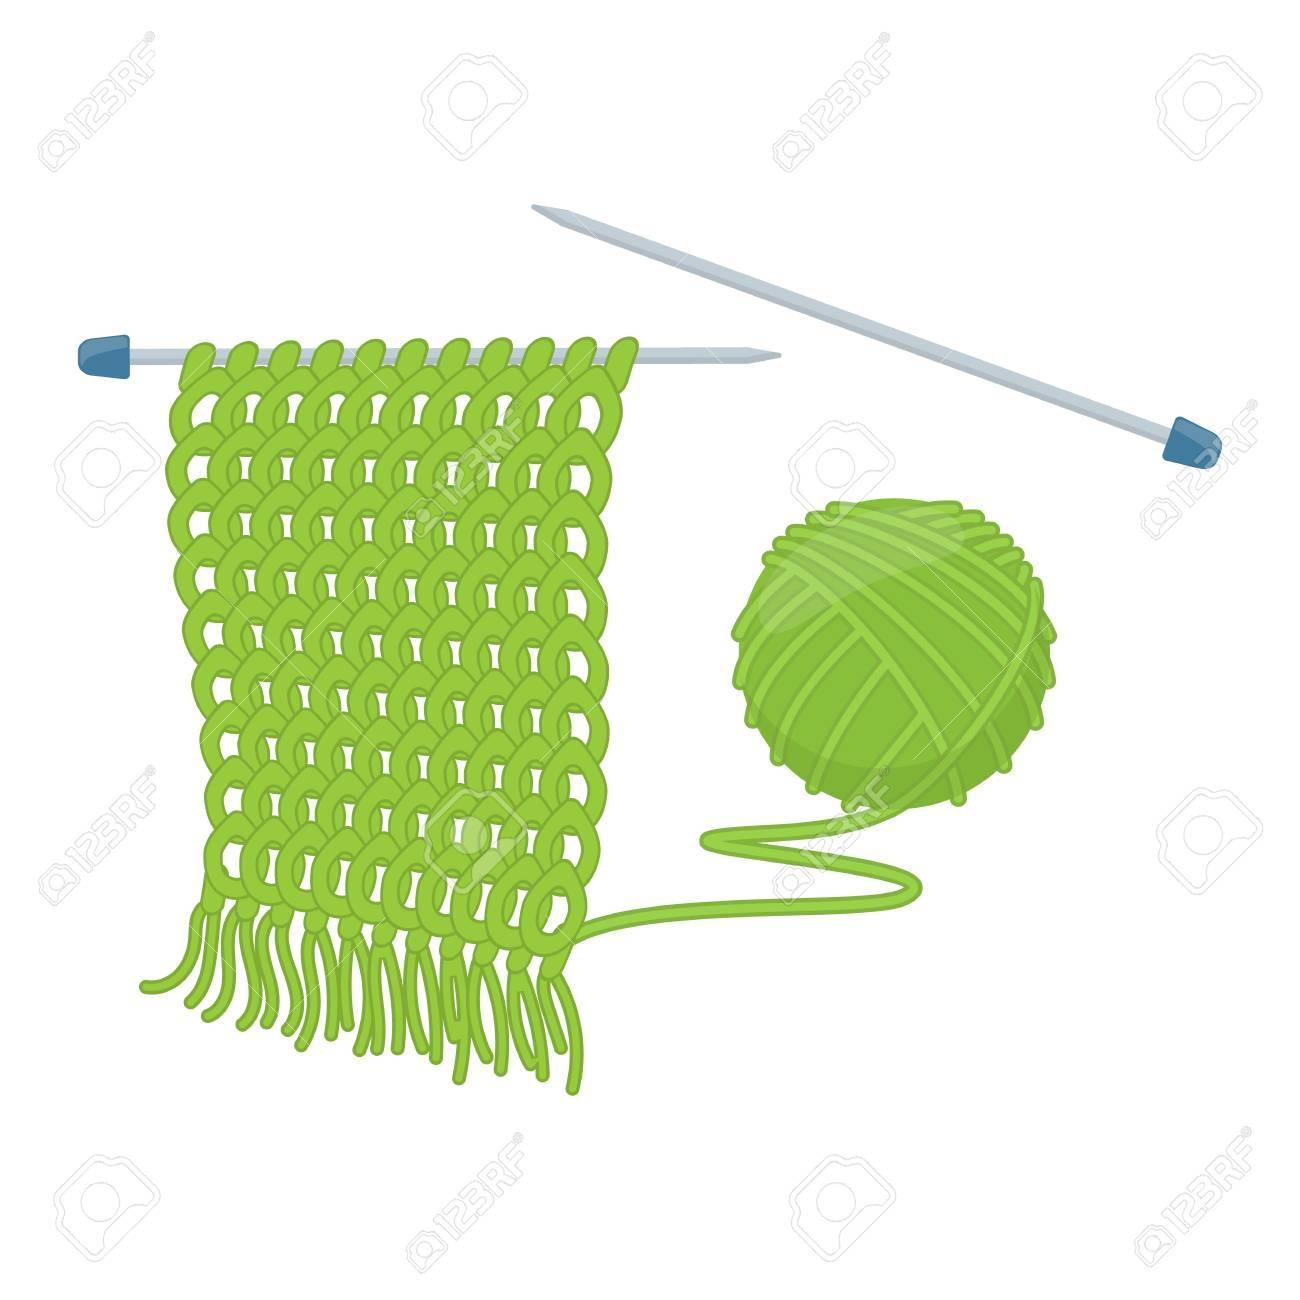 Tangle Of Yarn And Knitting Needles Cartoon Illustration Of